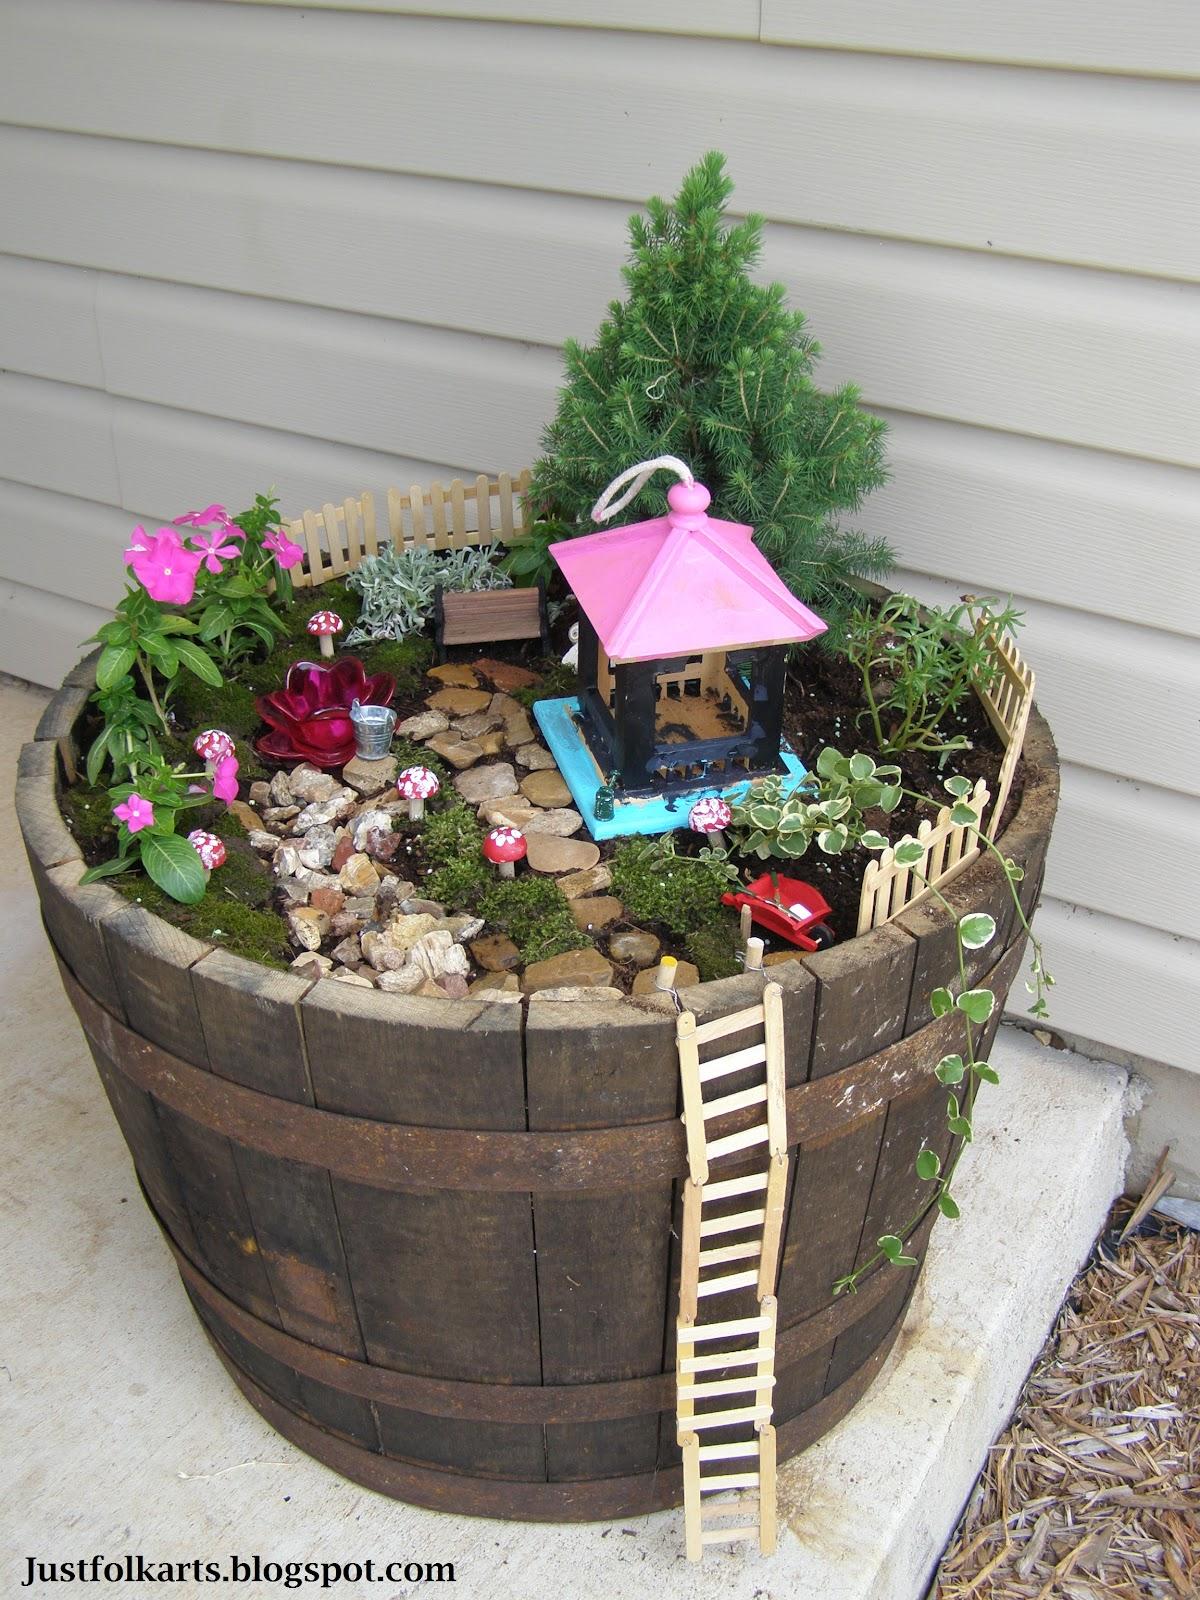 Just Folk Art Making Our Very Own Fairy Garden Part 2